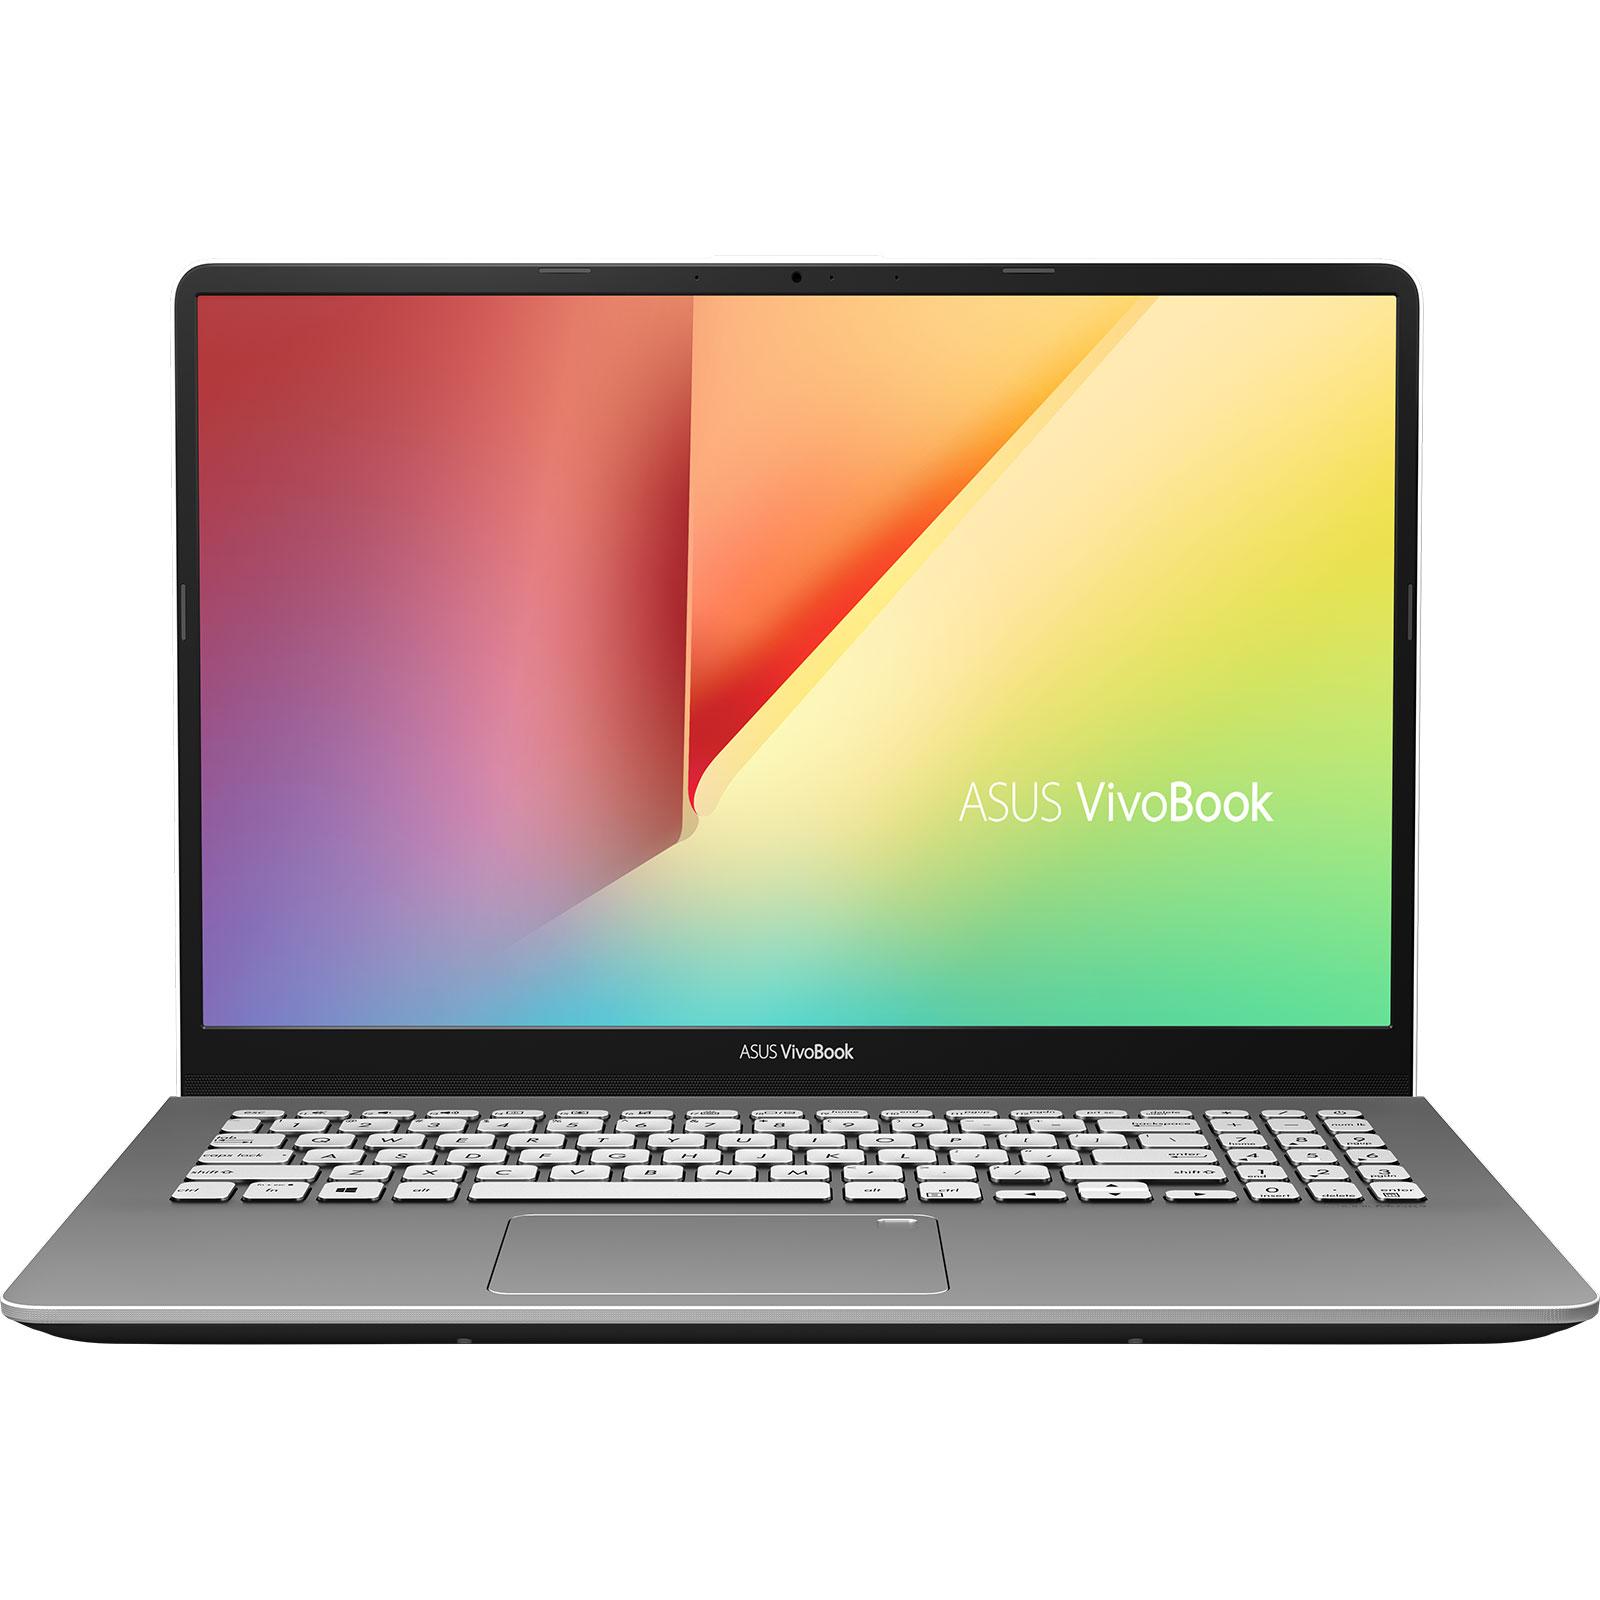 "PC portable ASUS Vivobook S15 S530UF-BQ189T Intel Core i5-8250U 8 Go SSD 128 Go + HDD 1 To 15.6"" LED Full HD NVIDIA GeForce MX130 Wi-Fi AC/Bluetooth Webcam Windows 10 Famille 64 bits (garantie constructeur 2 ans)"